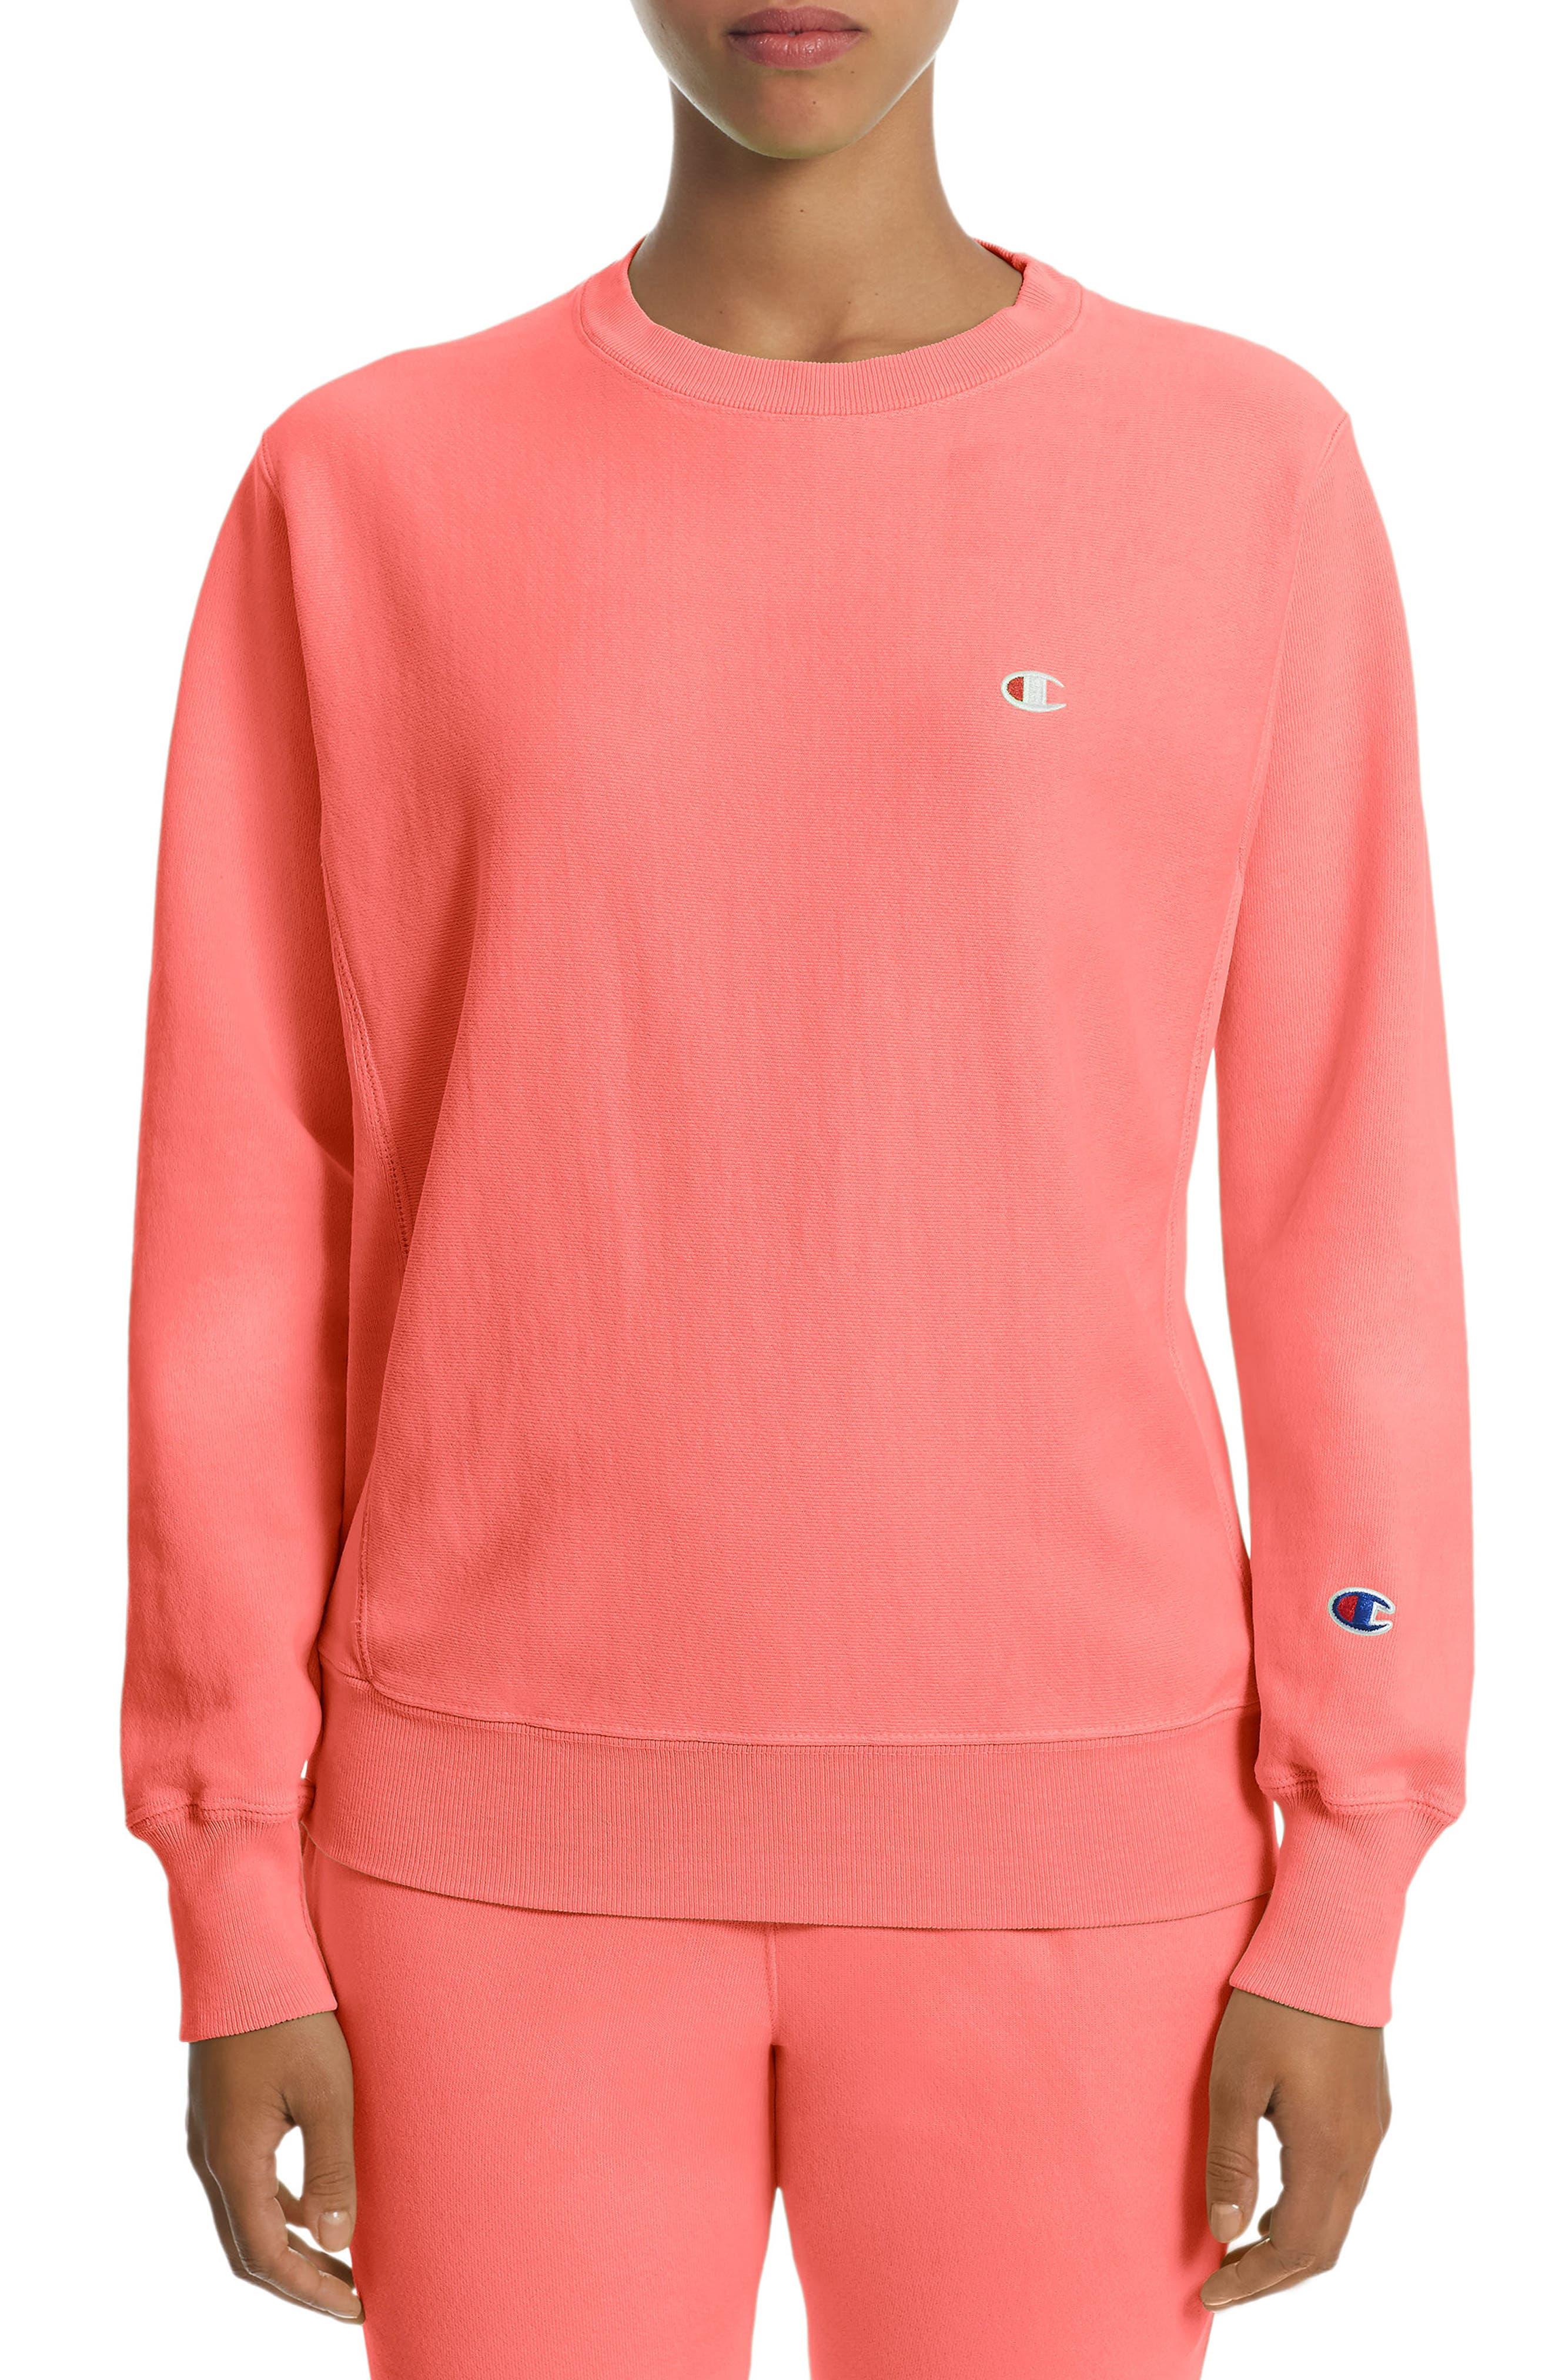 Champion Pigment Dyed Reverse Weave® Crewneck Sweatshirt